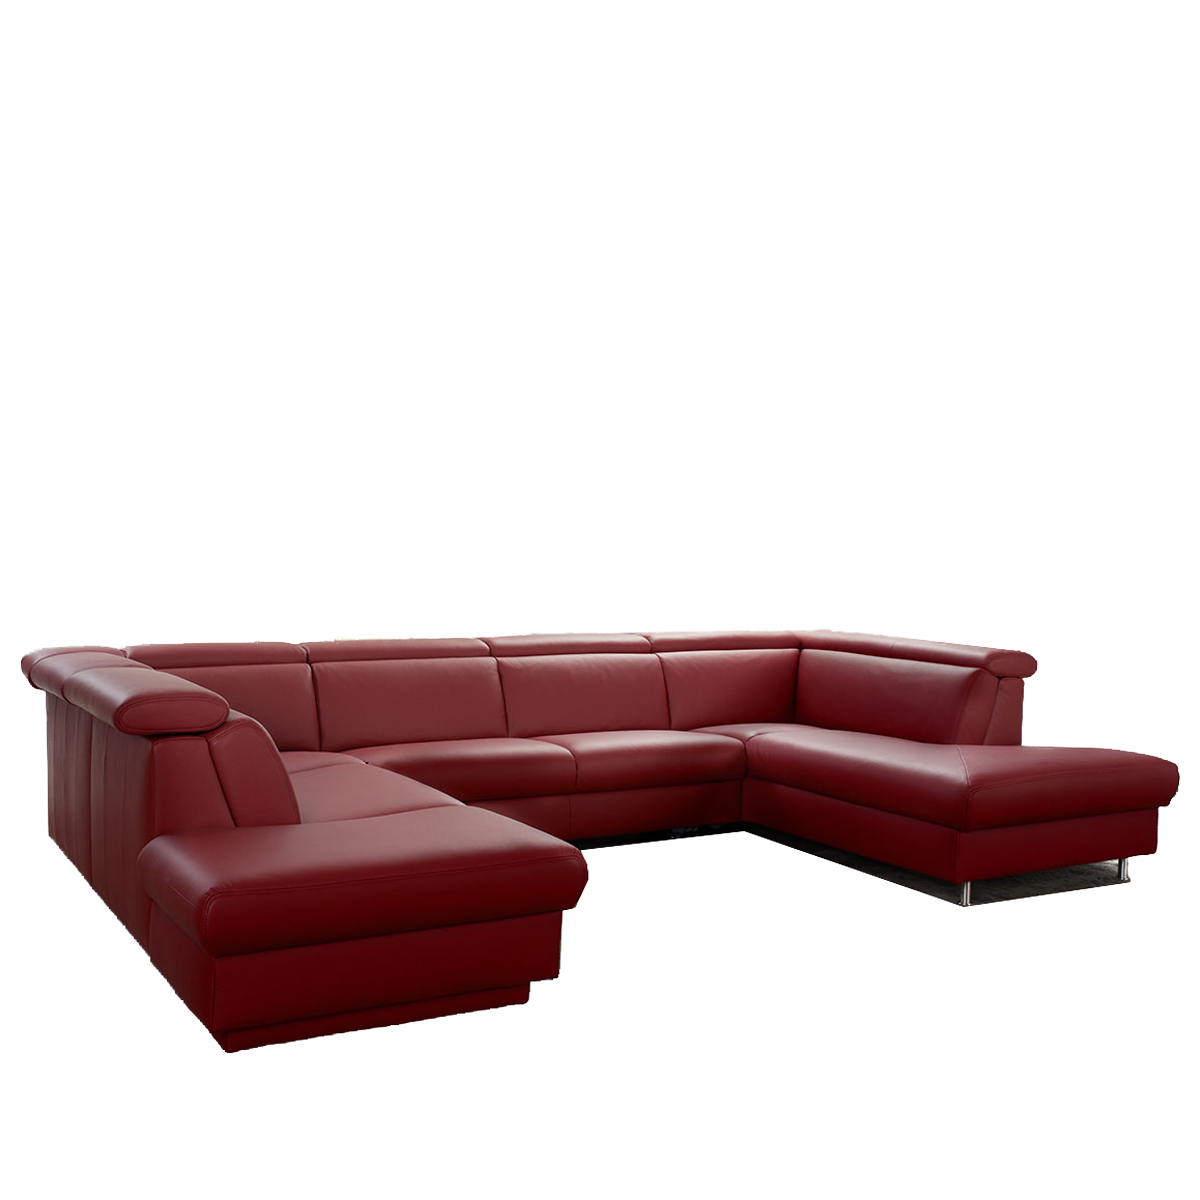 Großes Sofa 9701 In U Form Aus Dem Hause Himolla Ca 241 X 361 Cm